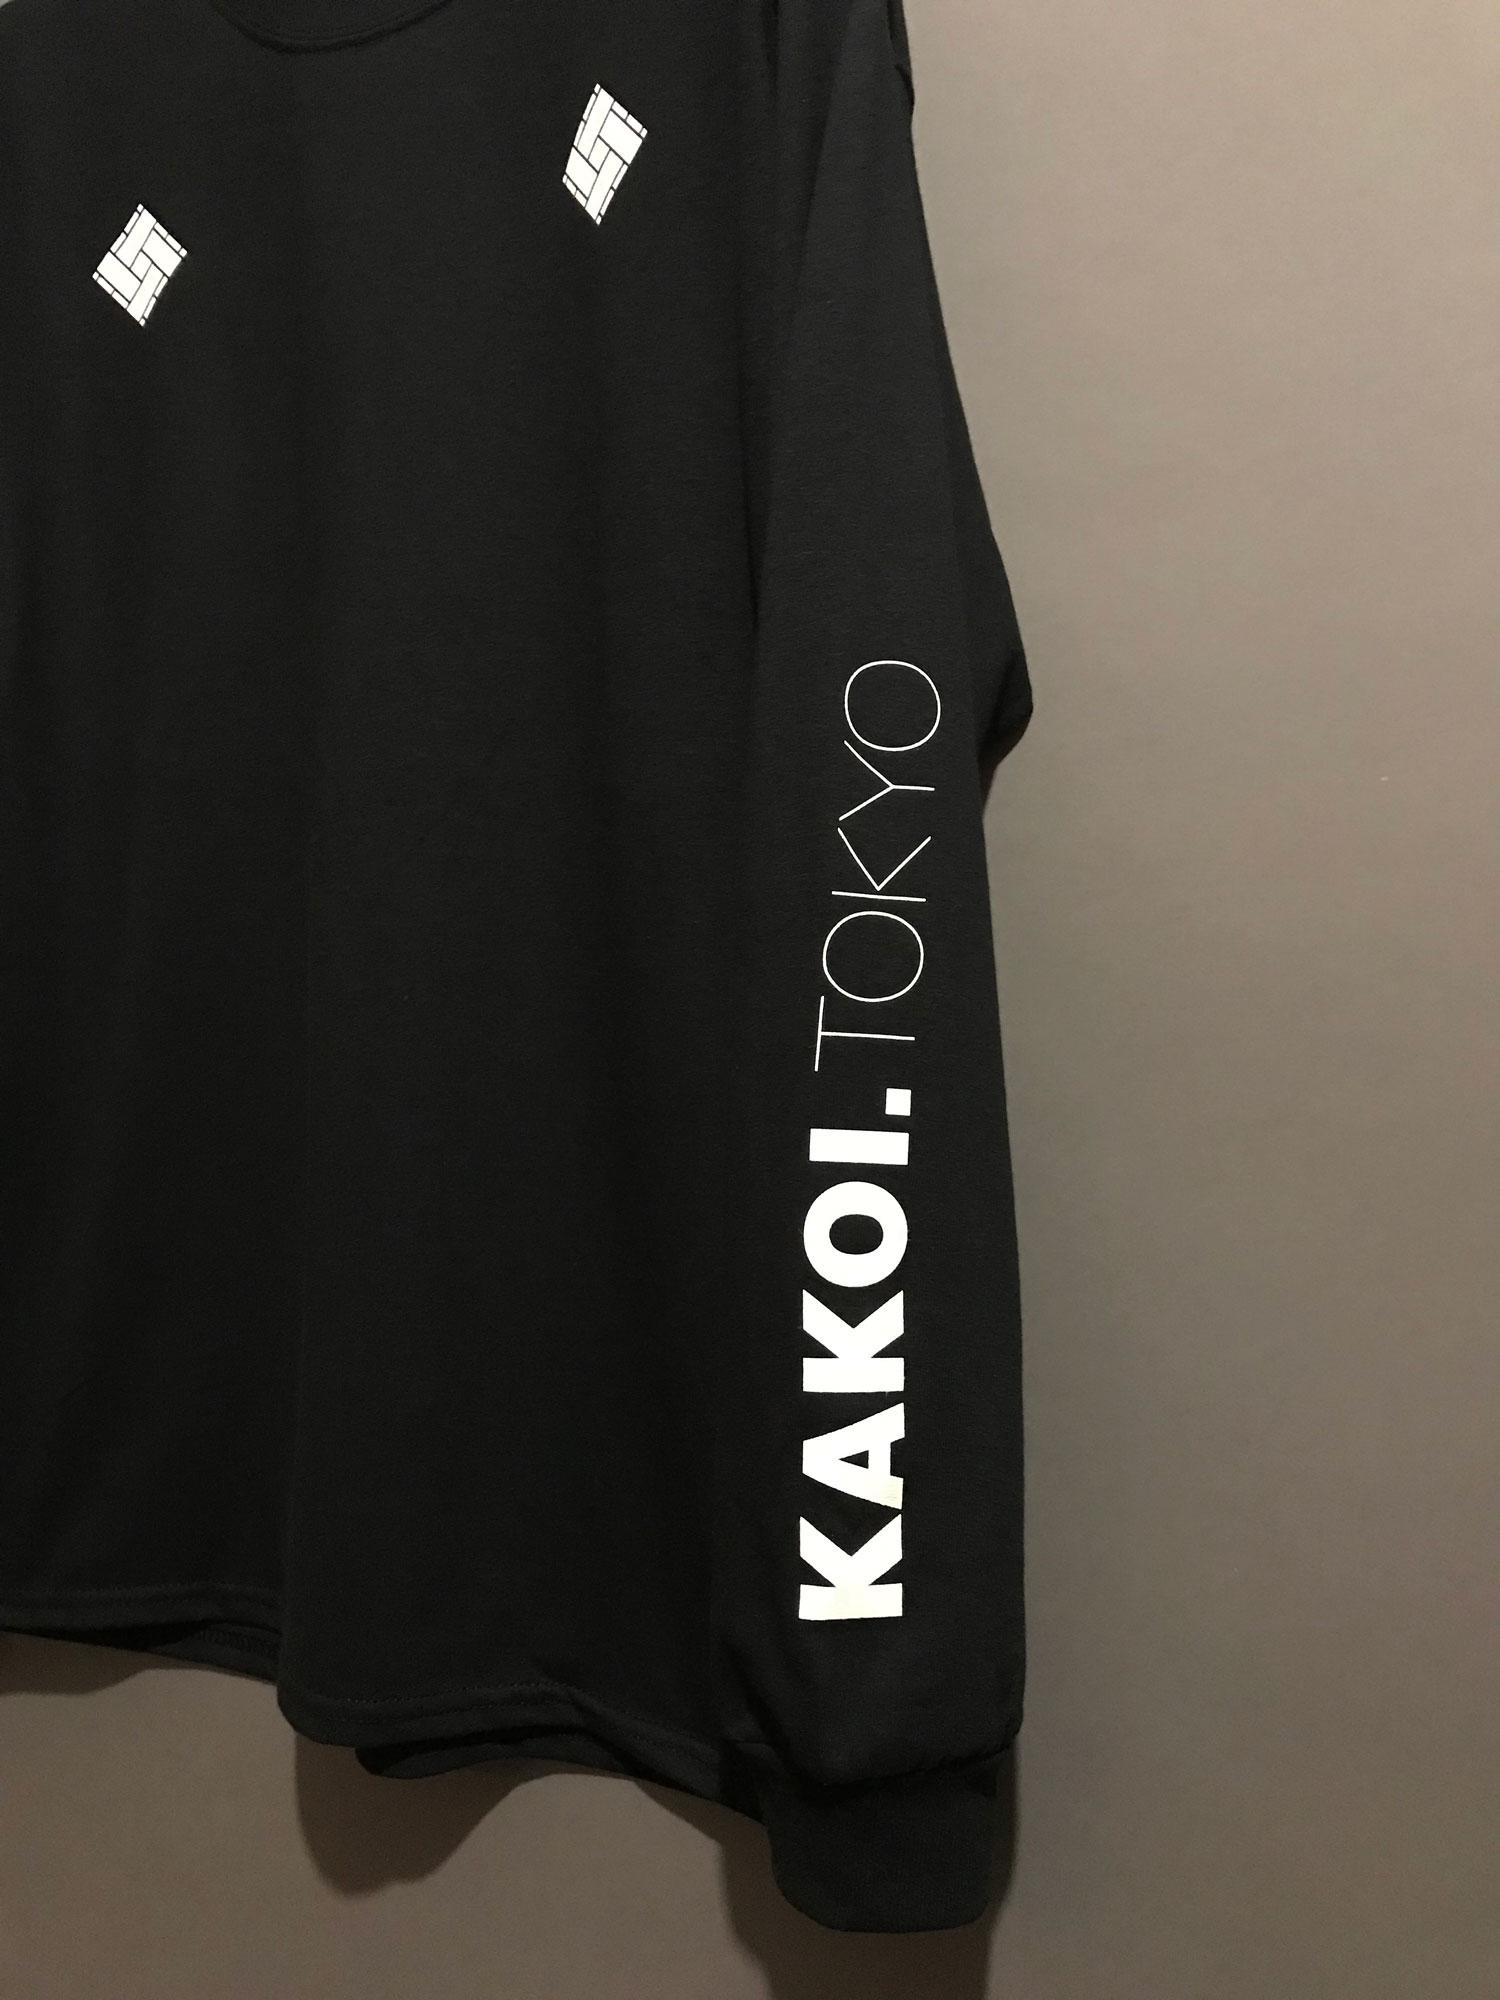 KKLS-002-BKWH